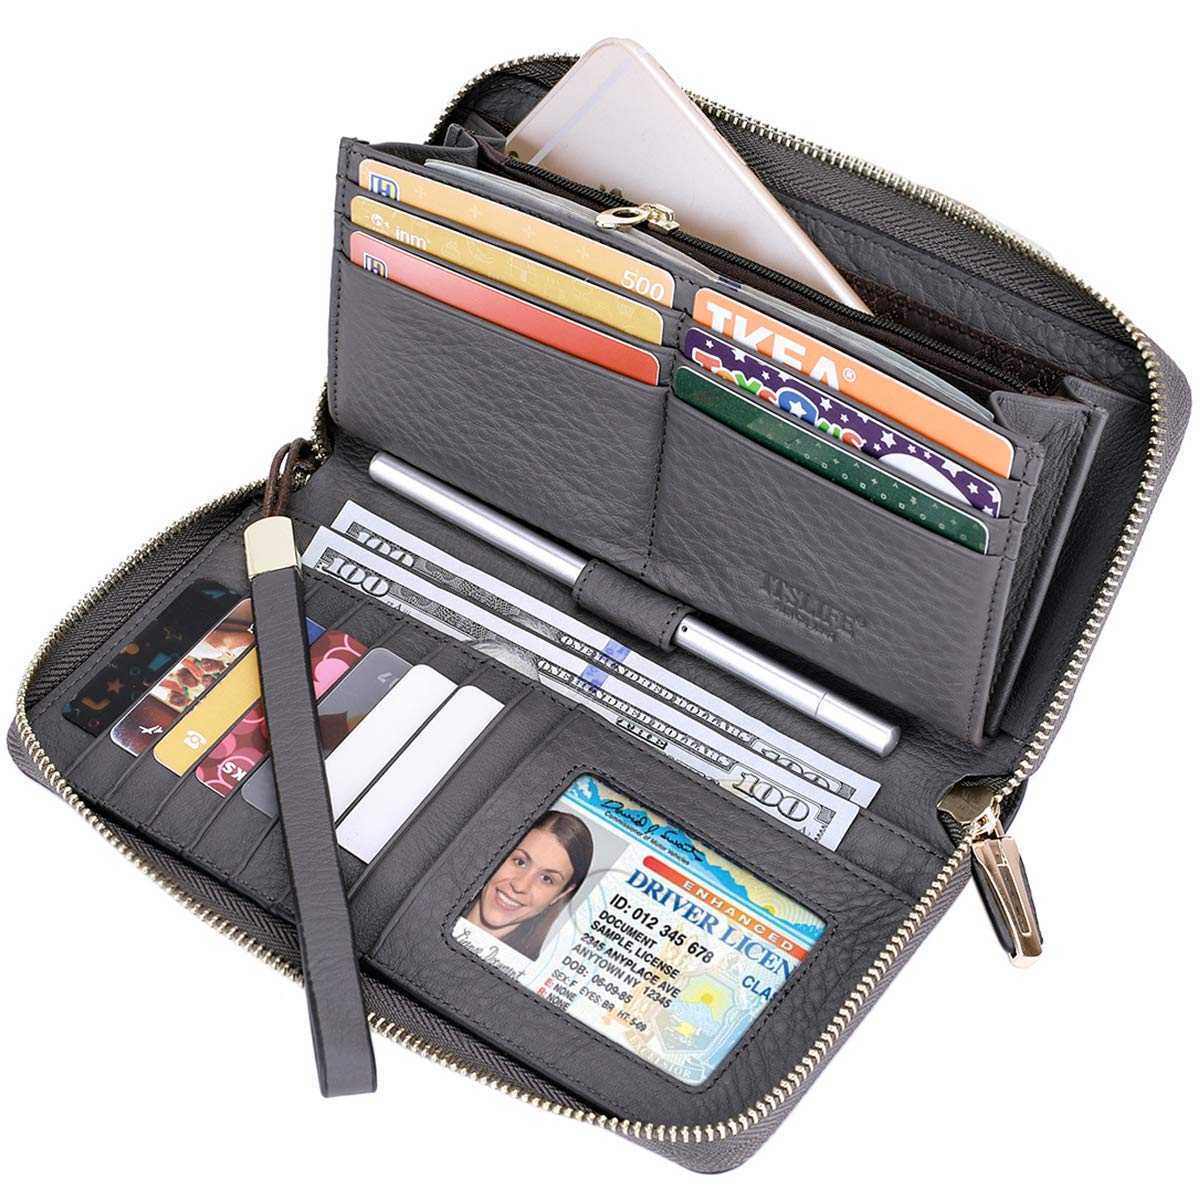 Itslife Women RFID Blocking Wallet Leather Zip Around Phone Clutch Large Travel Purse Wristlet (Grey) by ITSLIFE